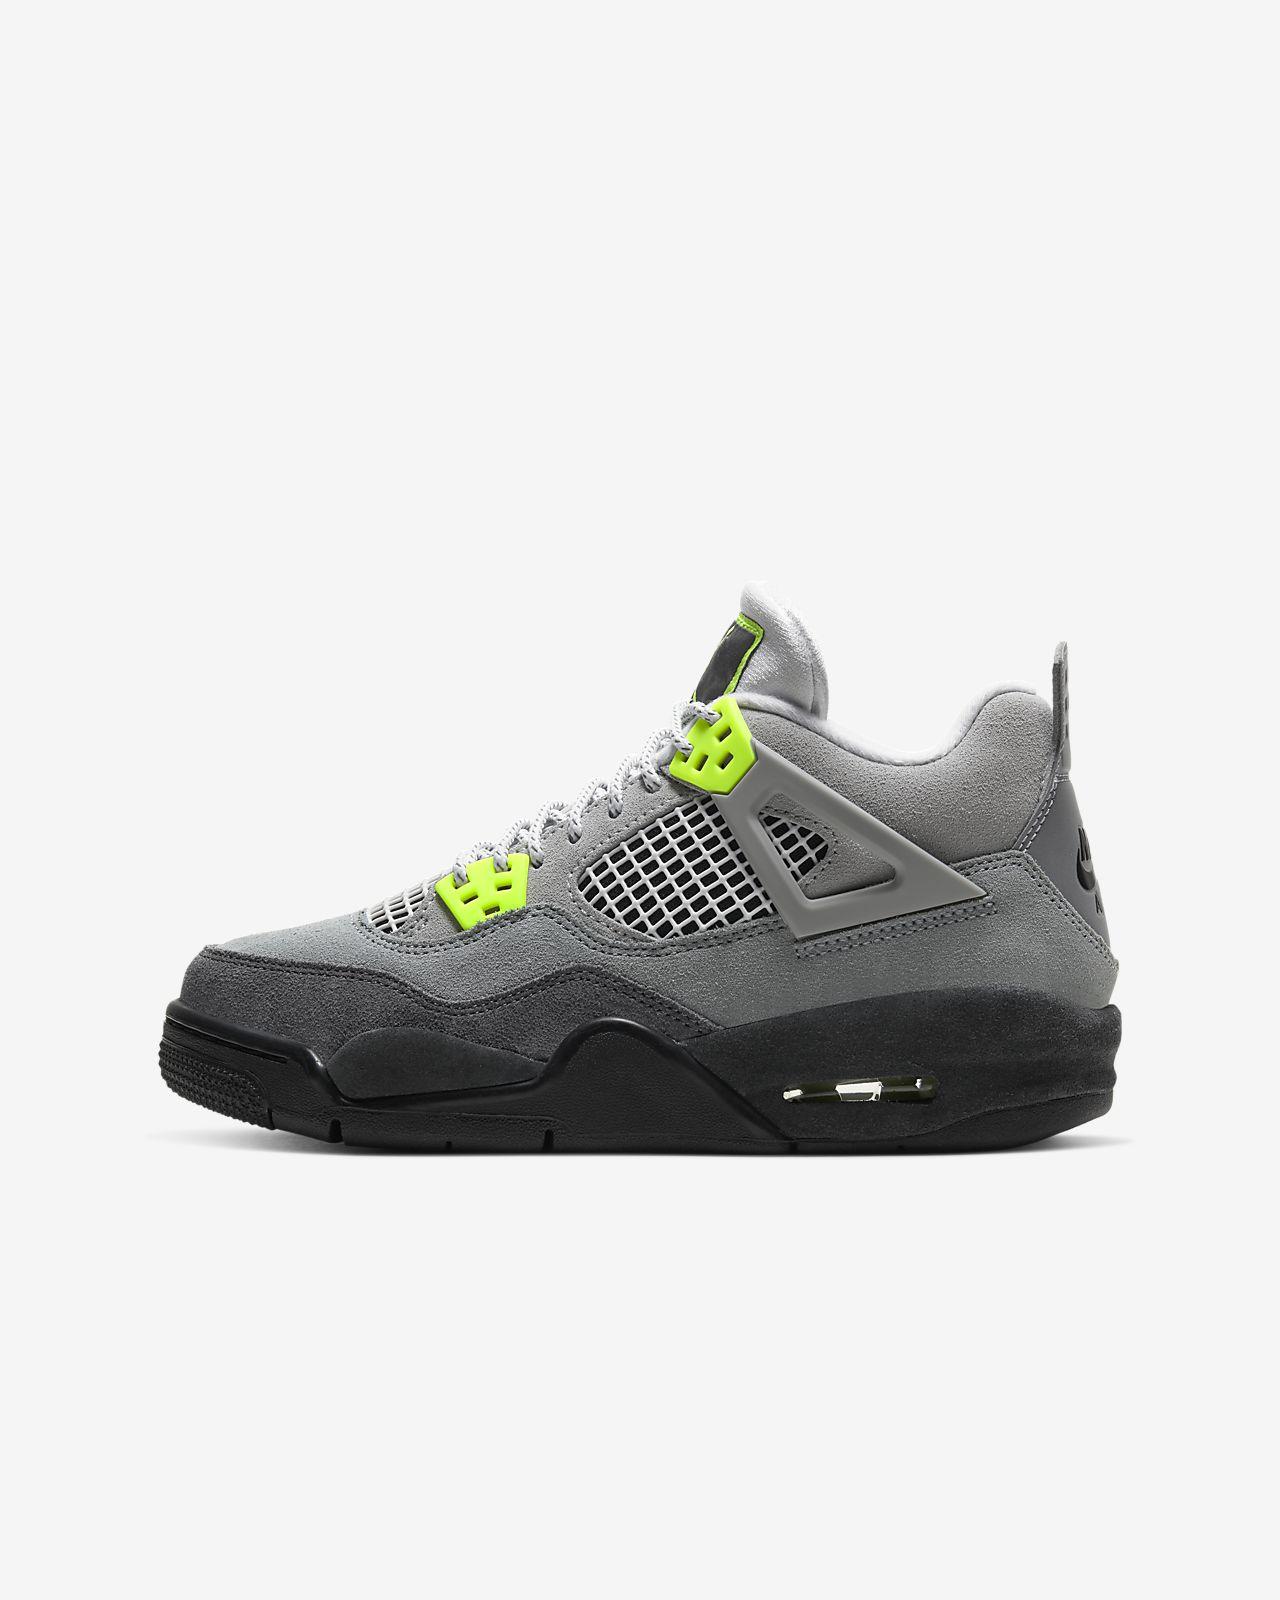 Air Jordan IV Shoe